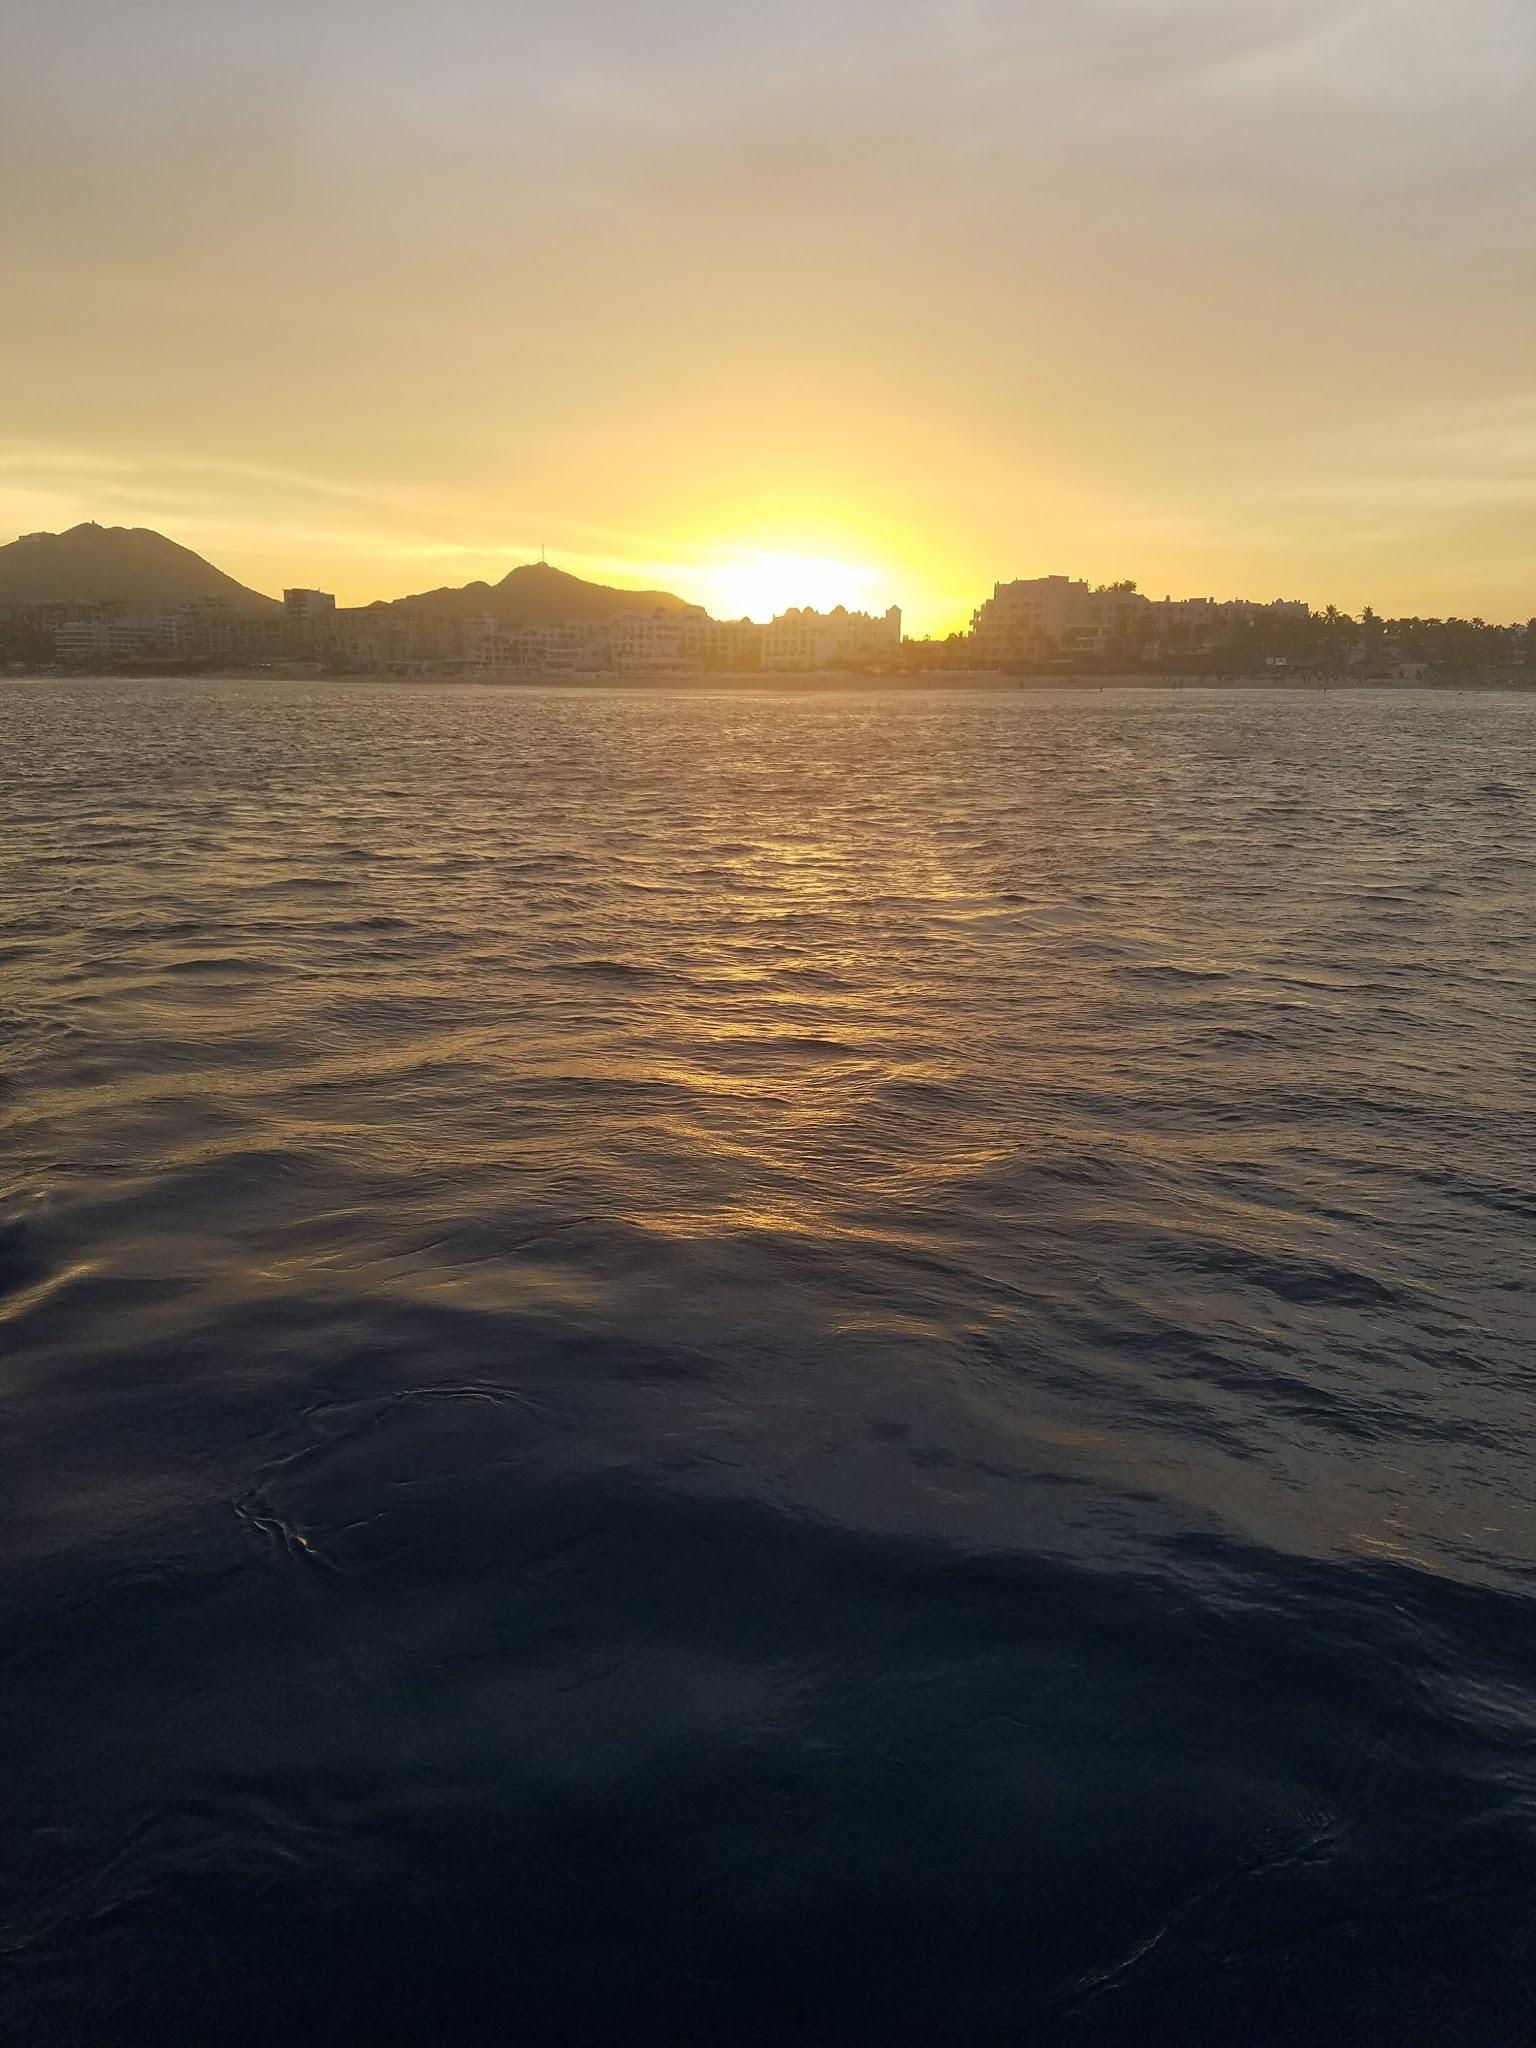 Sunset off the coast of Cabo San Lucas